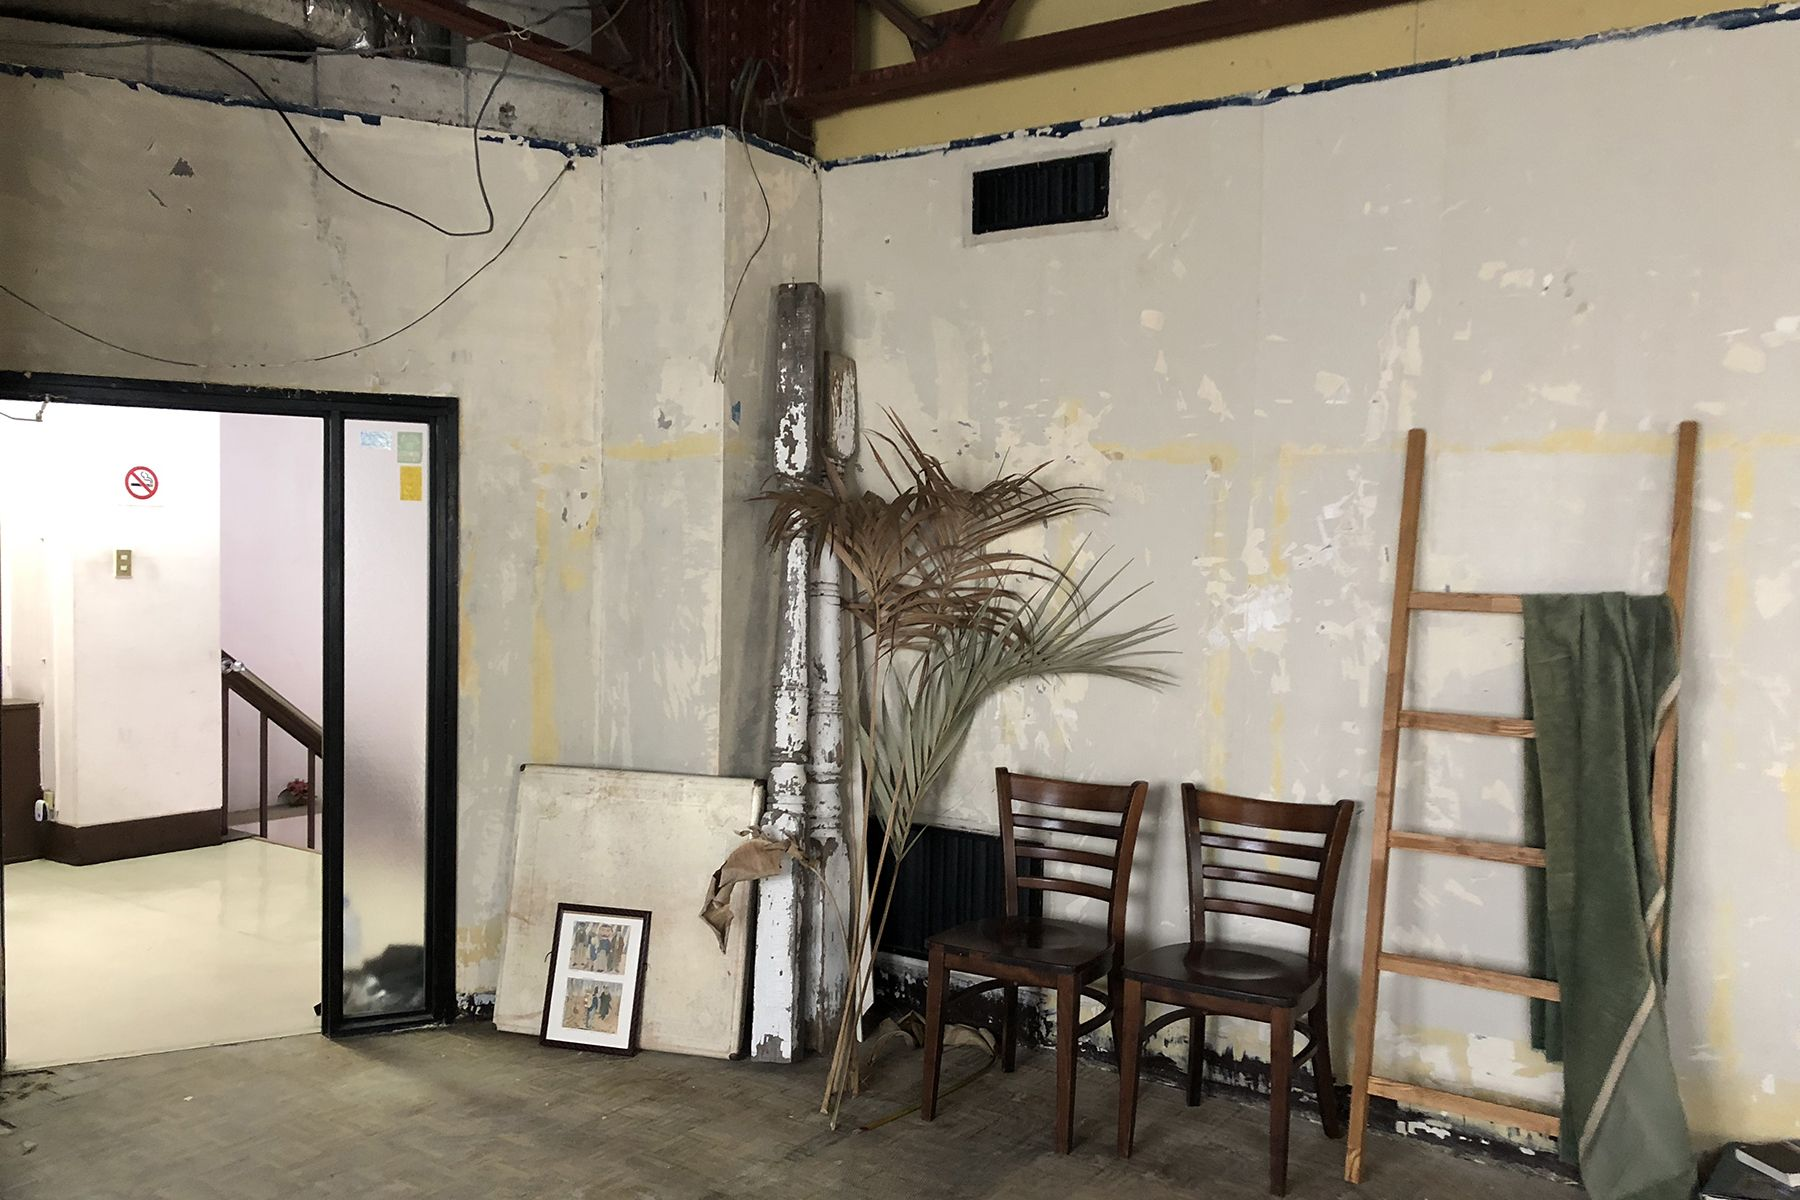 rope 2F部屋の外からライティング可能